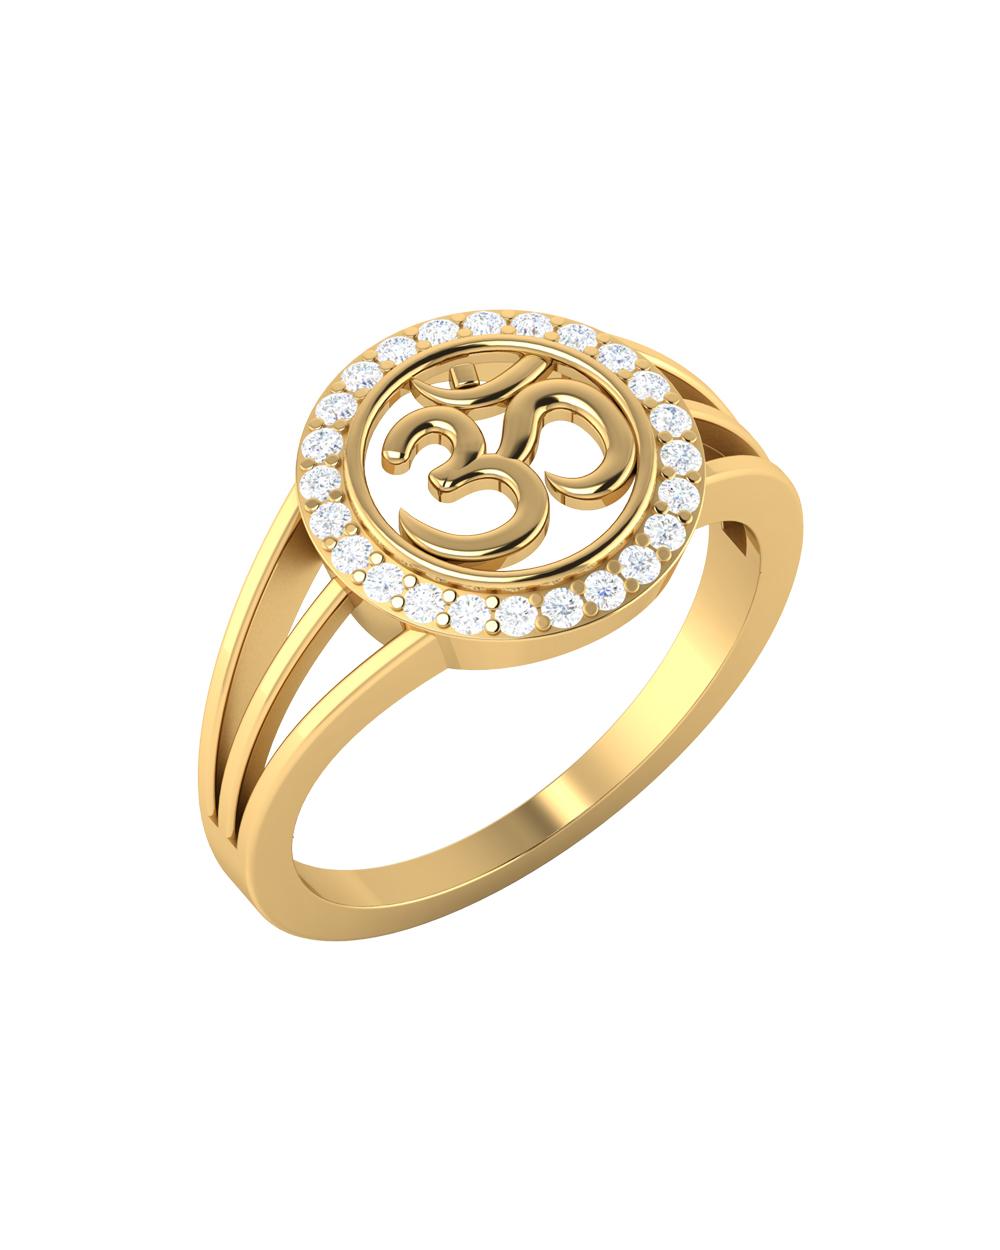 Buy OM Engraved 14K Gold Ring For Men Online India | Voylla